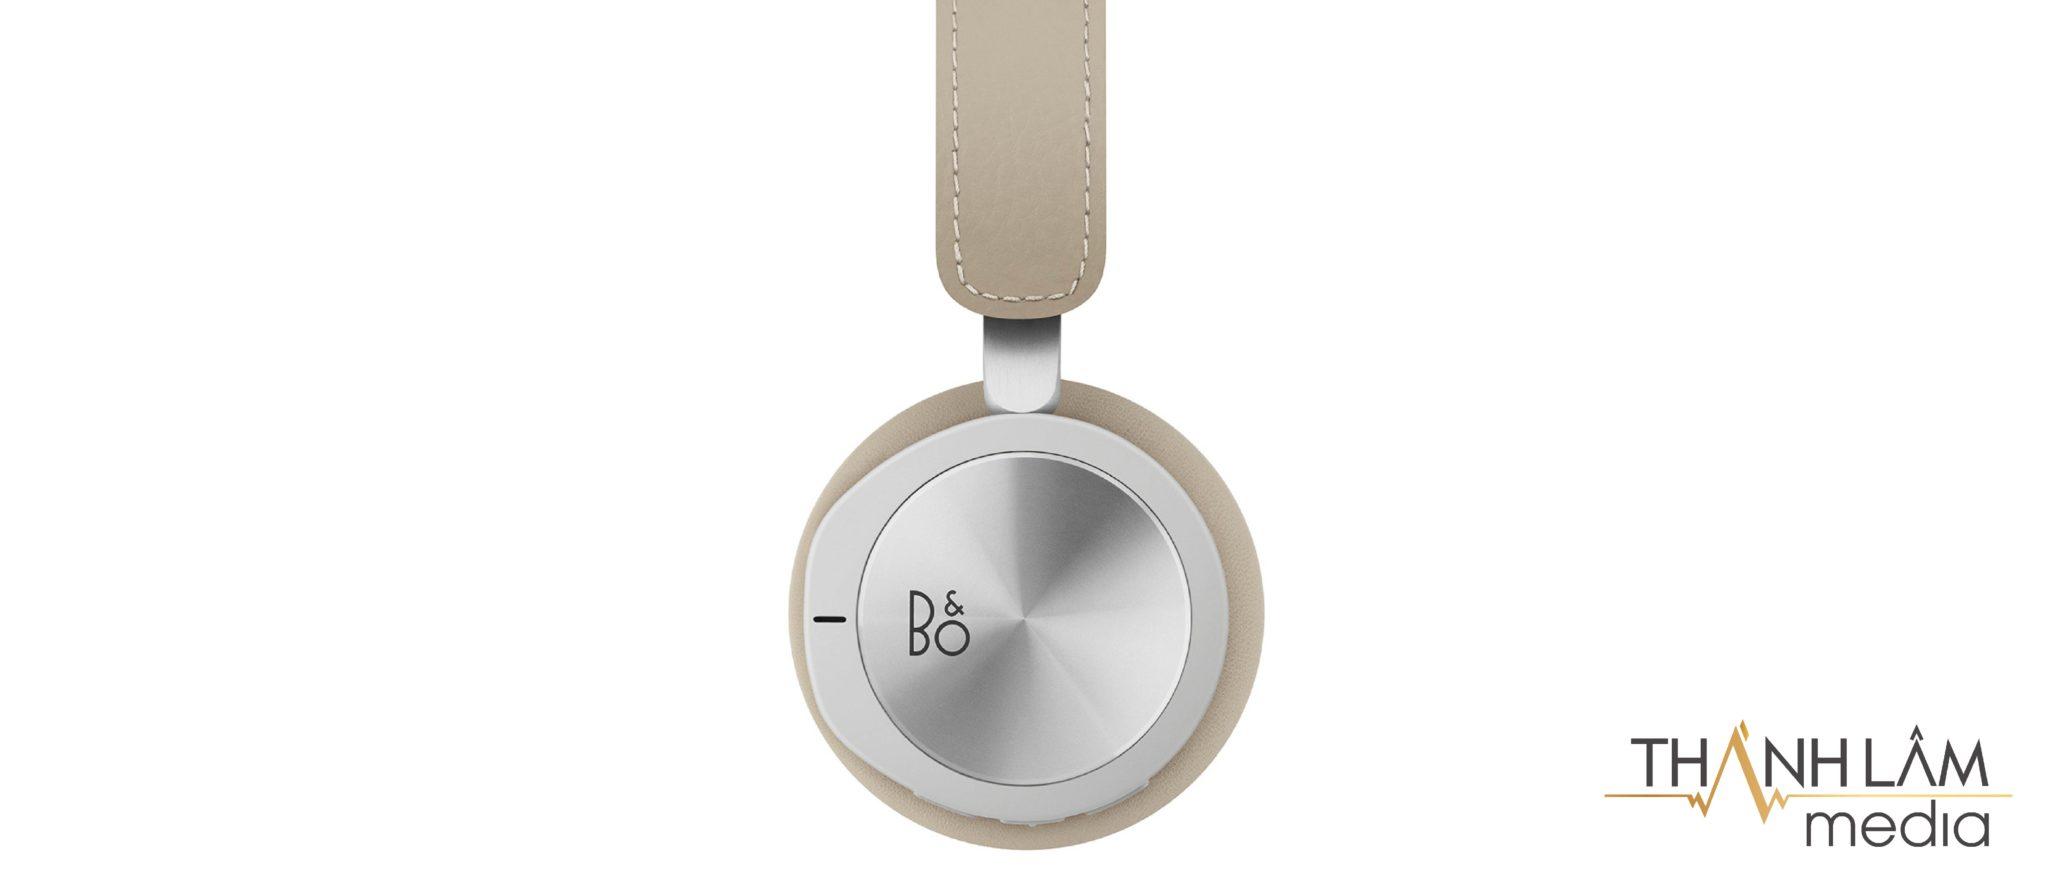 beoplay-h8i-bang-olufsen-06